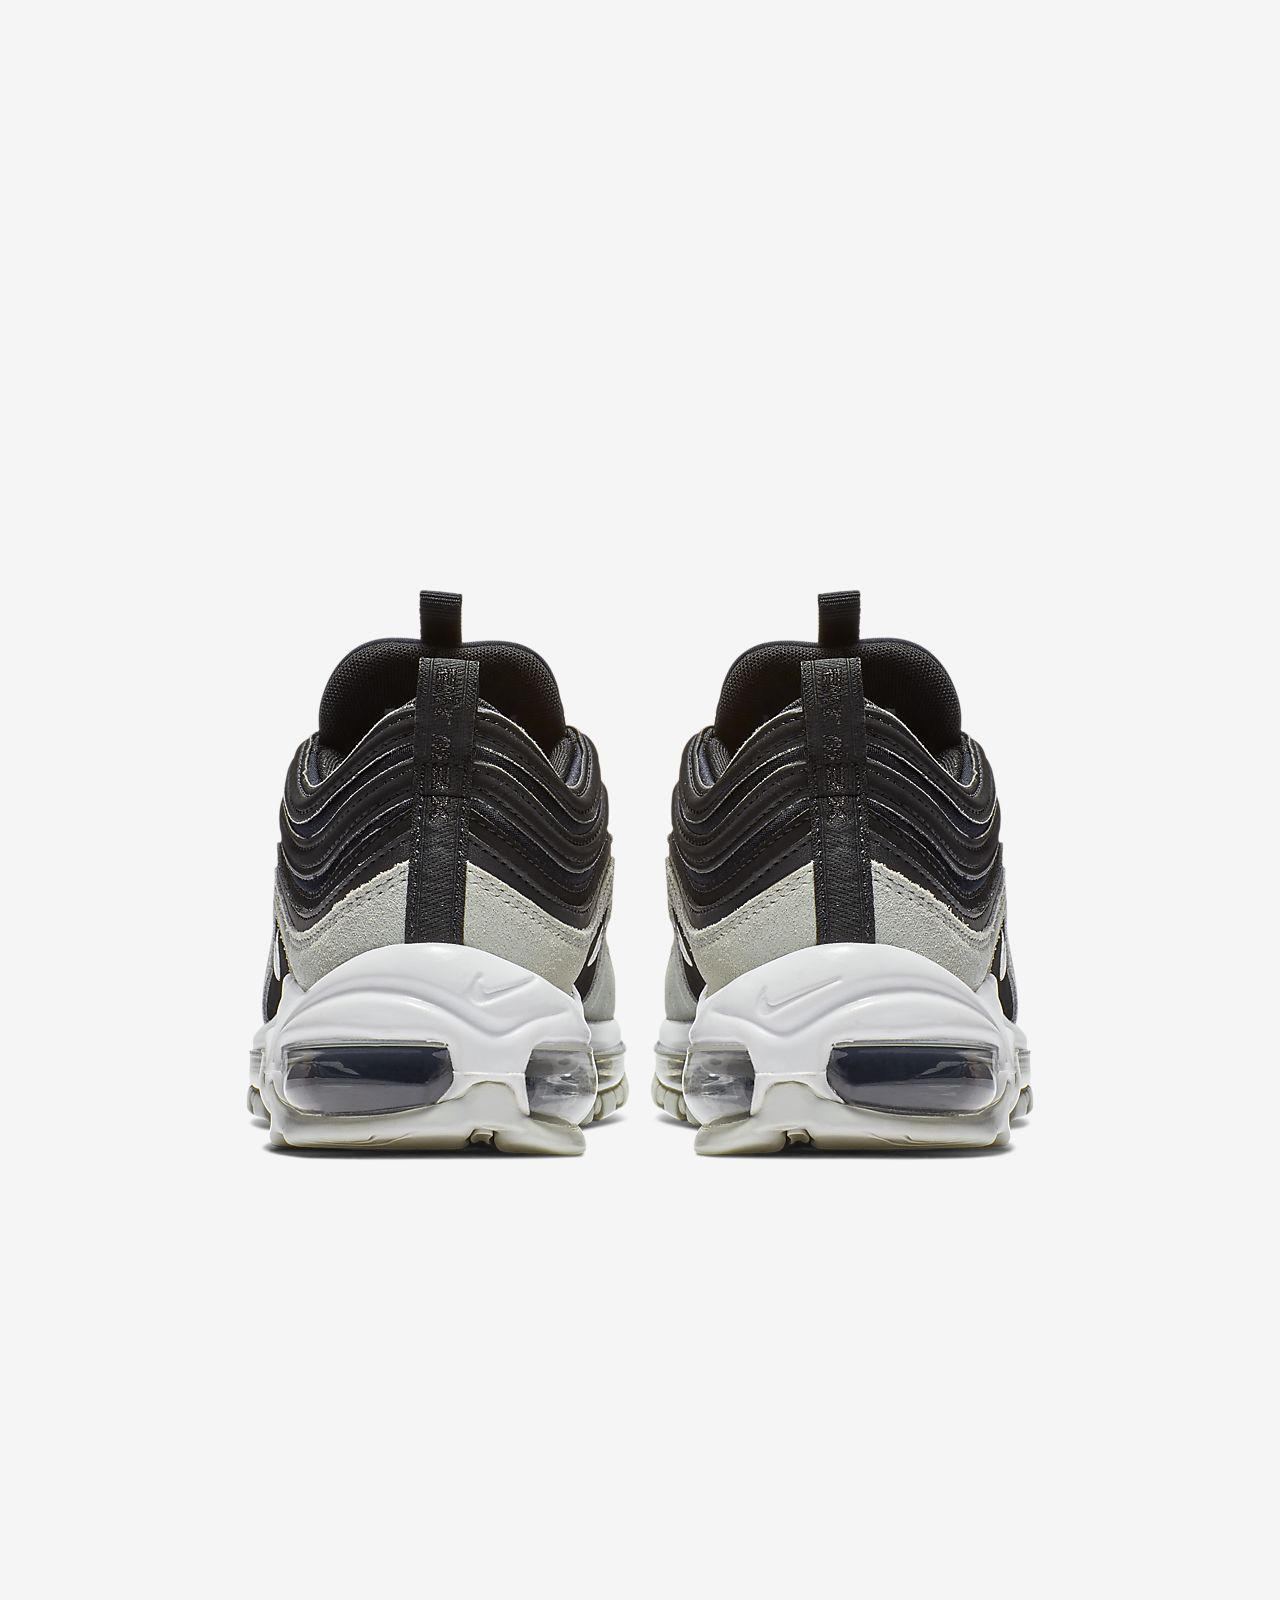 promo code 9b7cb f408d ... Nike Air Max 97 Premium Women s Shoe